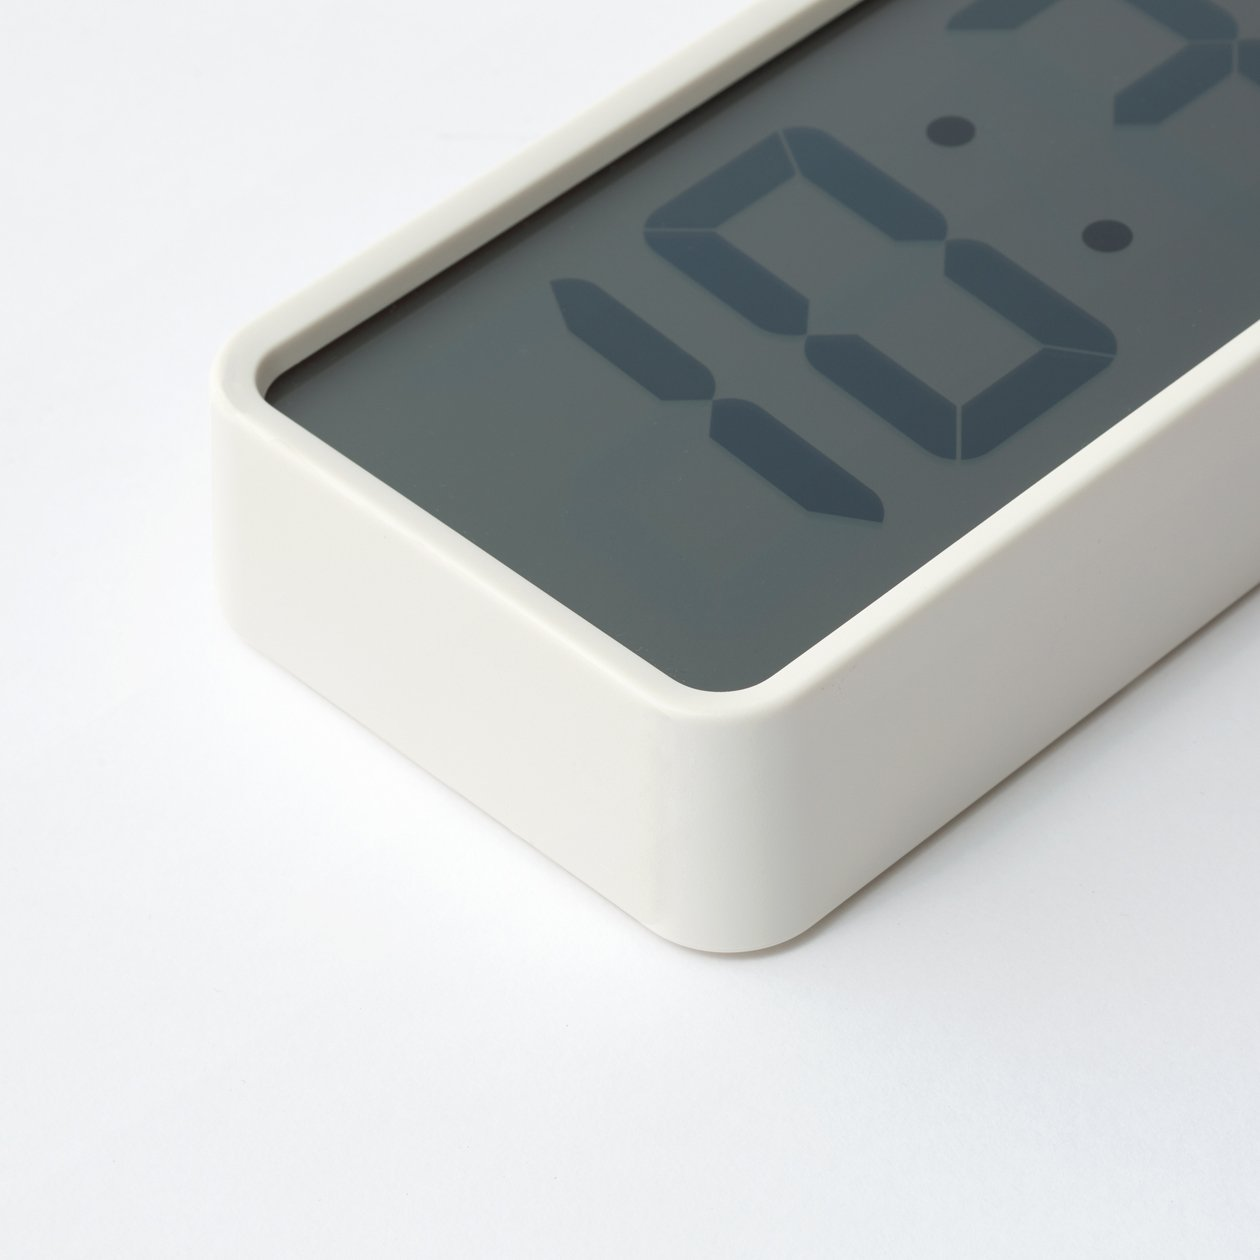 Amazon.com: [MUJI] Reloj digital Tamaño Grande Blanco ...